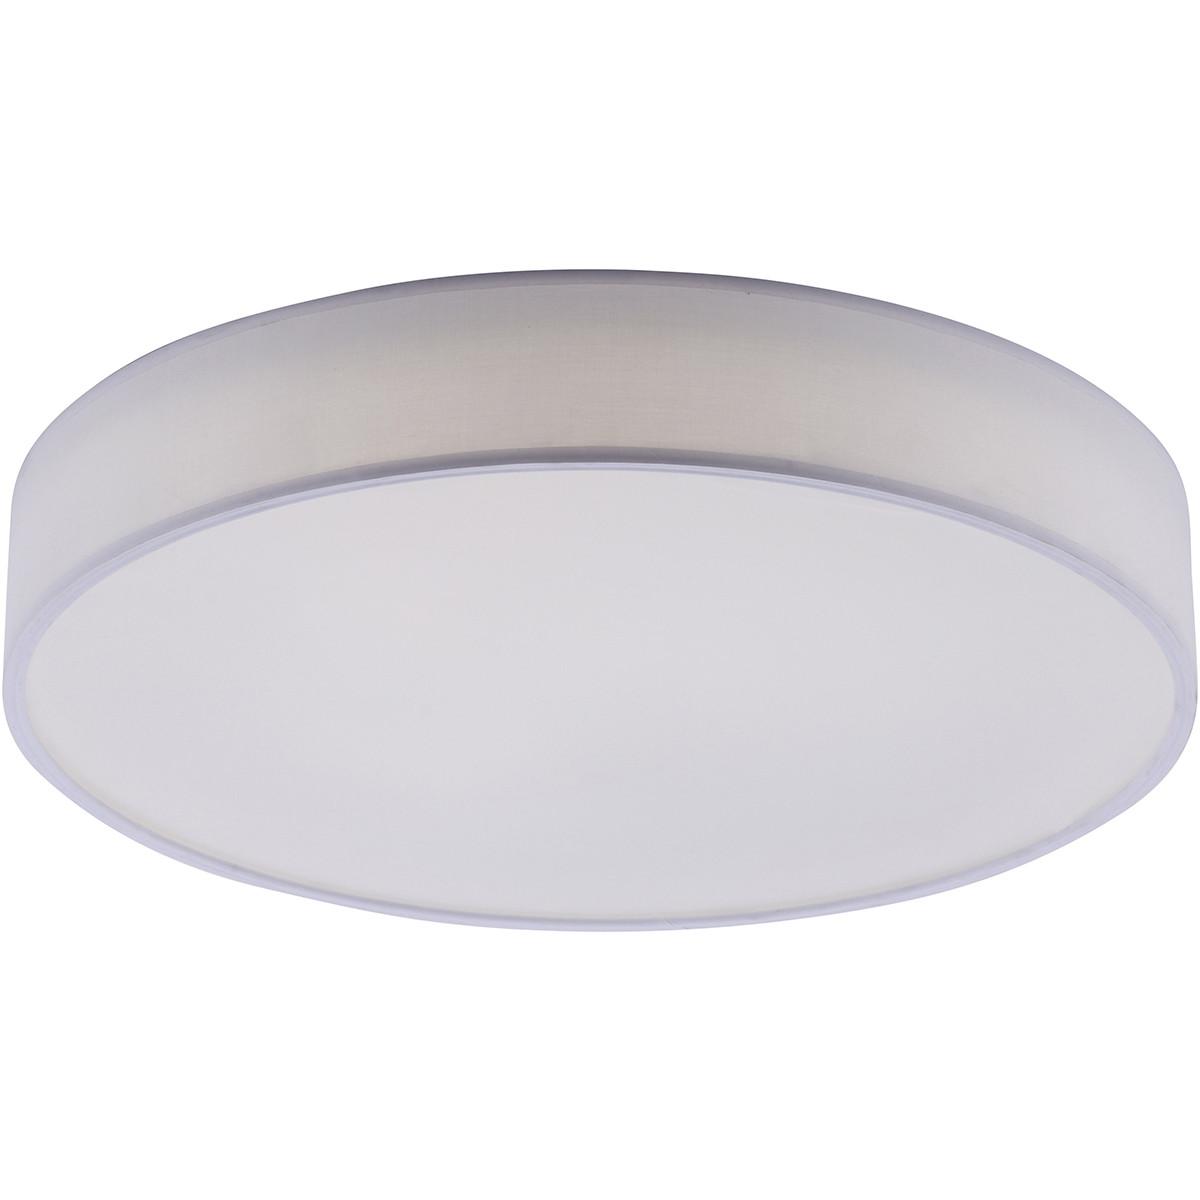 LED Plafondlamp WiZ - Smart LED - Trion Ditro - 45W - Aanpasbare Kleur - Dimbaar - Afstandsbediening